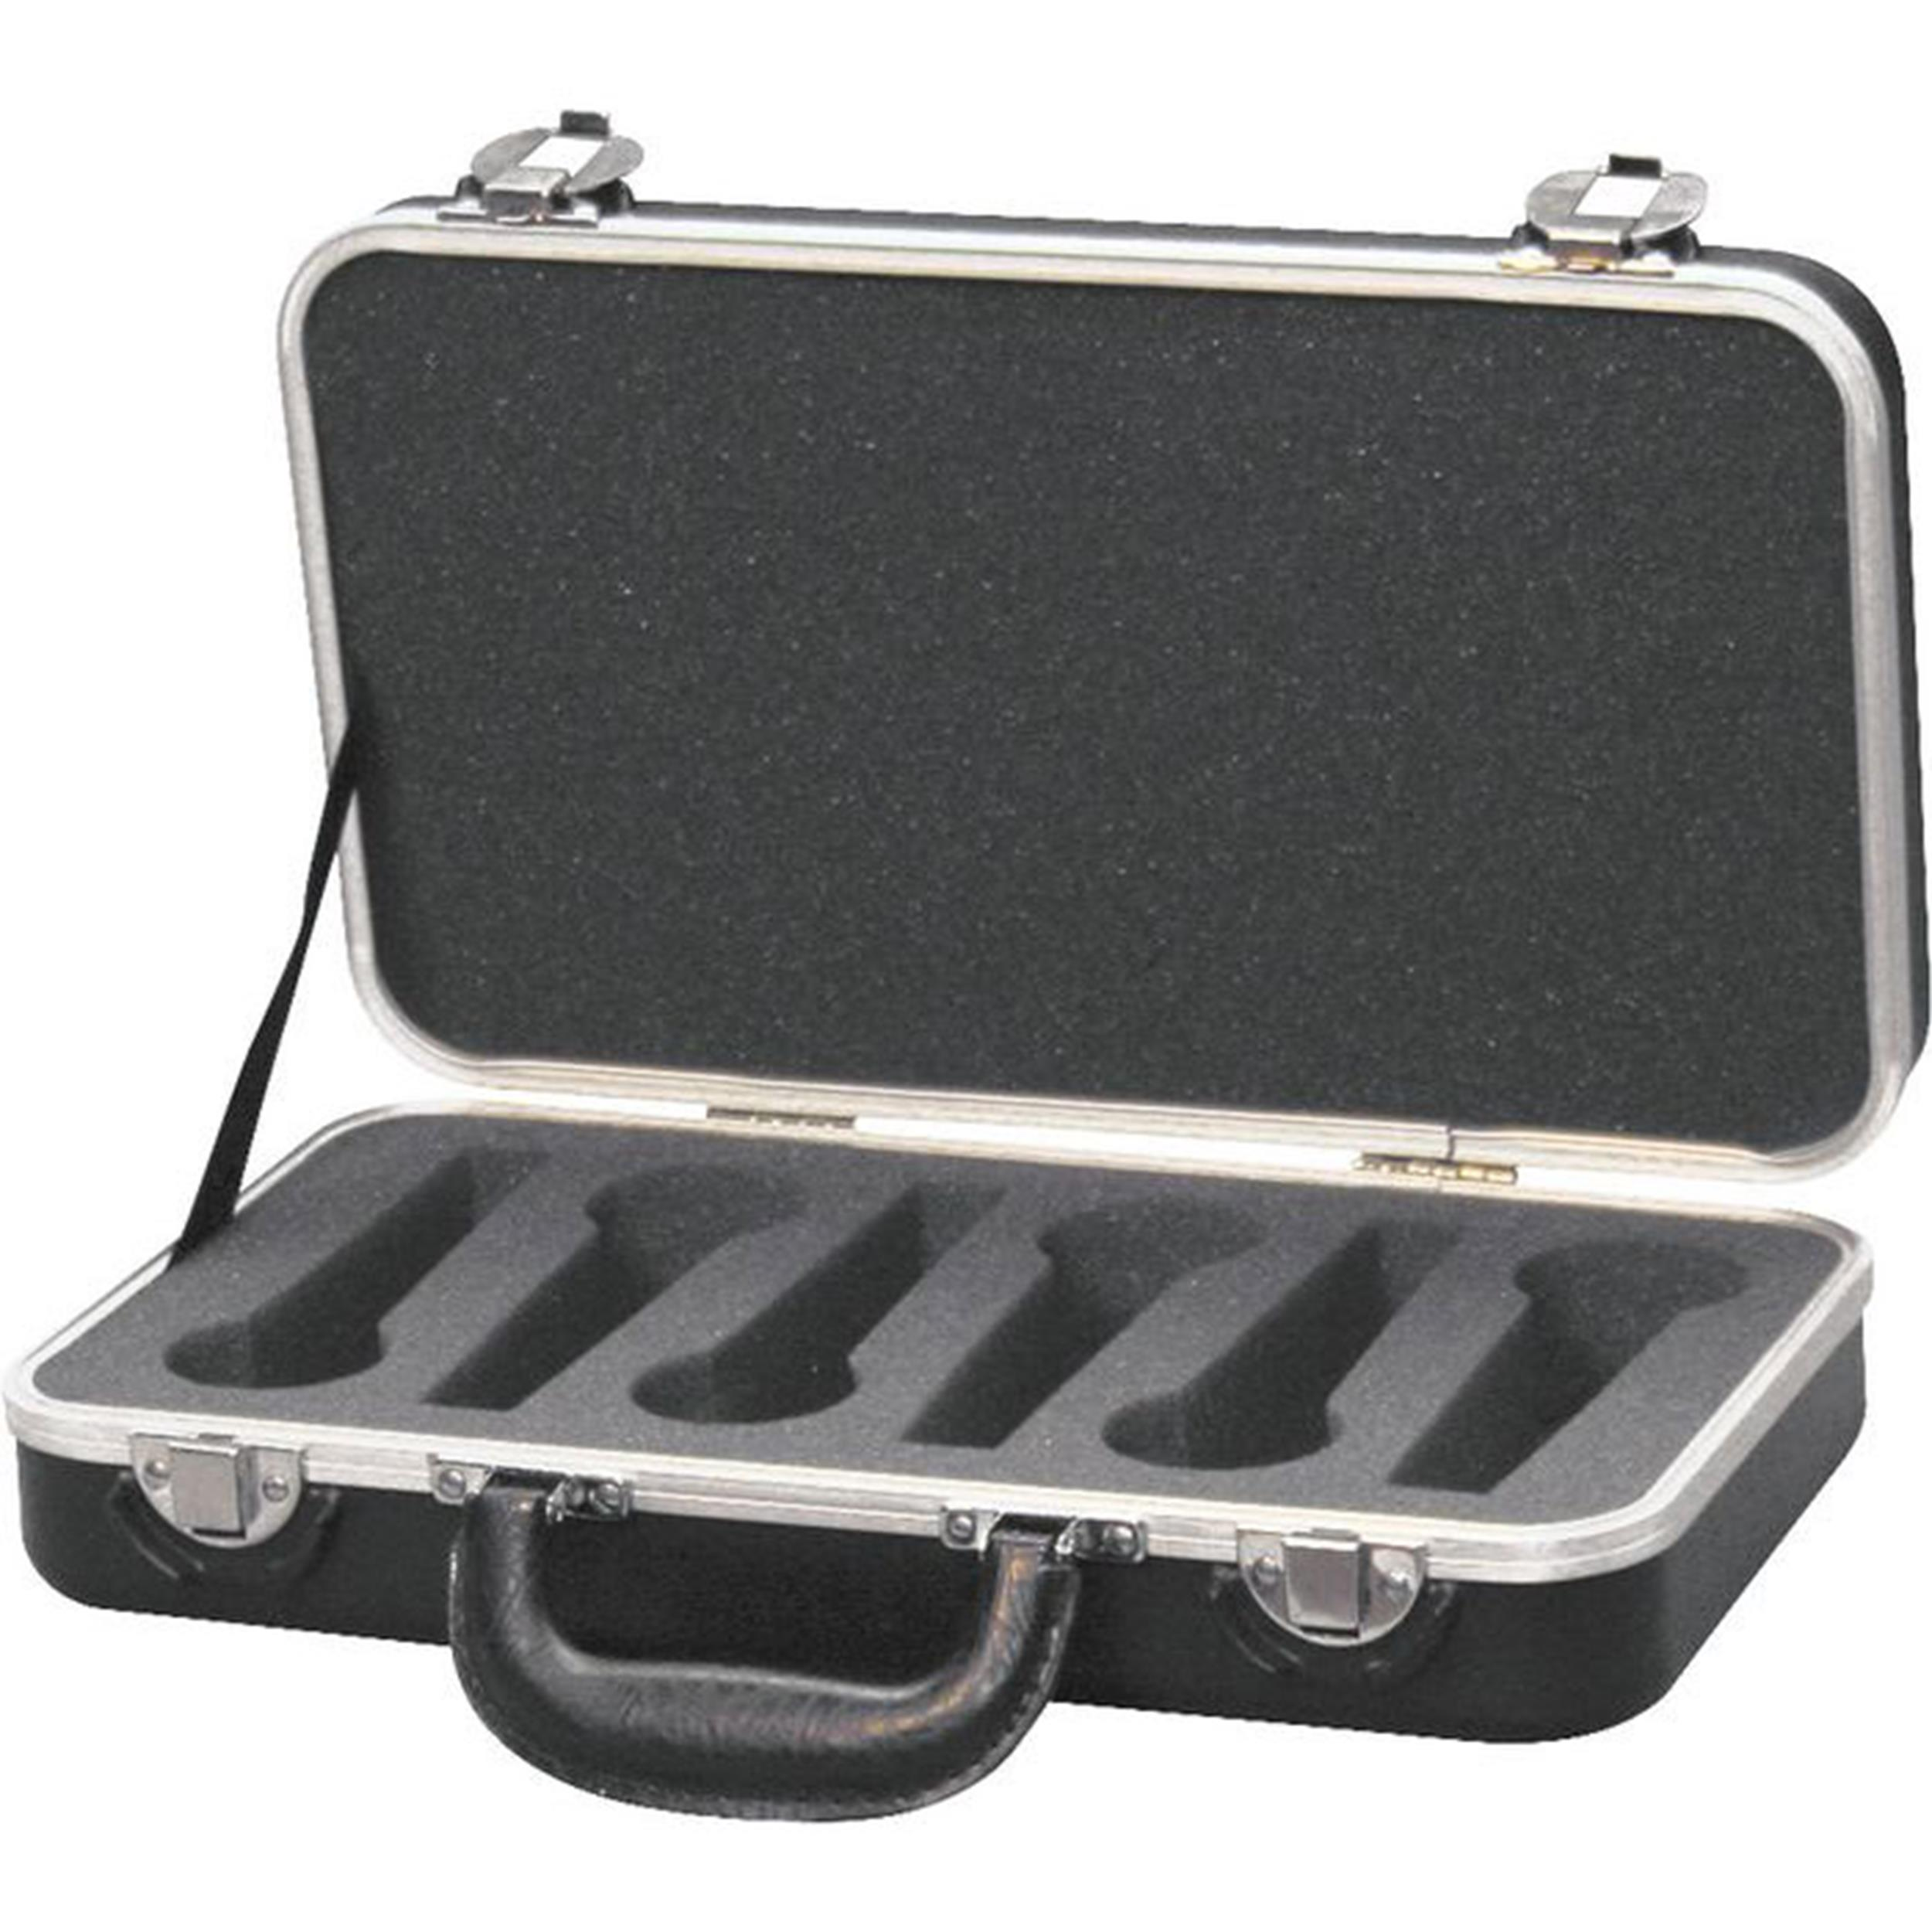 Gator-Cases-GM-6-PE-astuccio-per-microfoni-handheld-sku-2757728427009